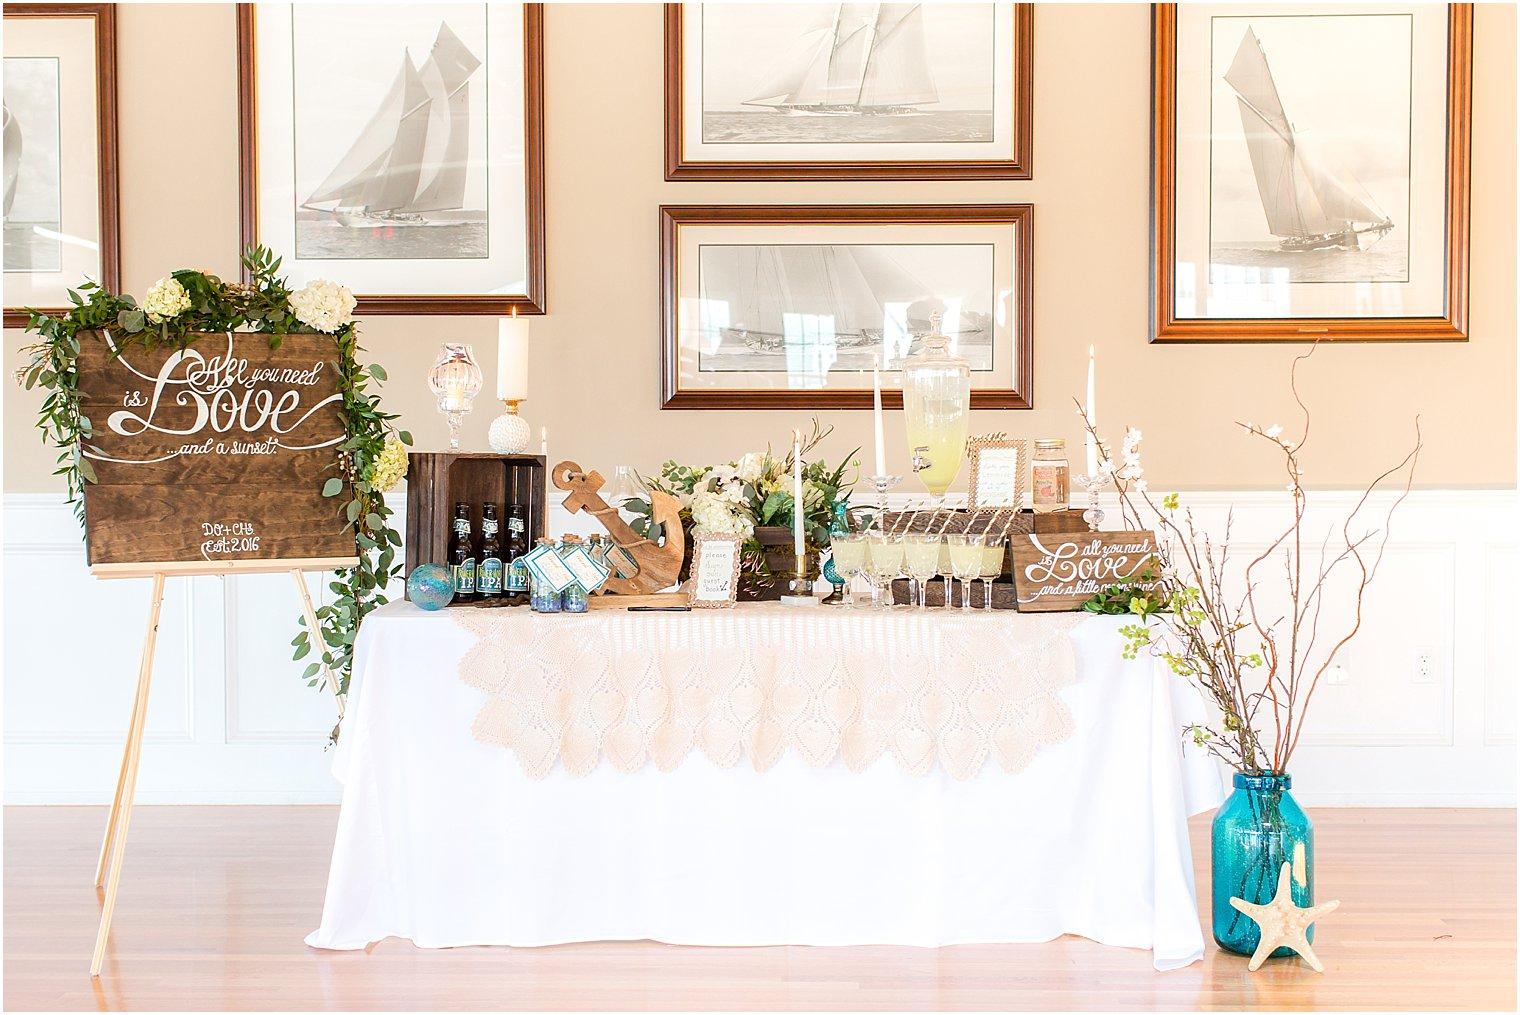 Brant Beach Yacht Club Wedding Inspiration Shoot LBI Wedding Venue